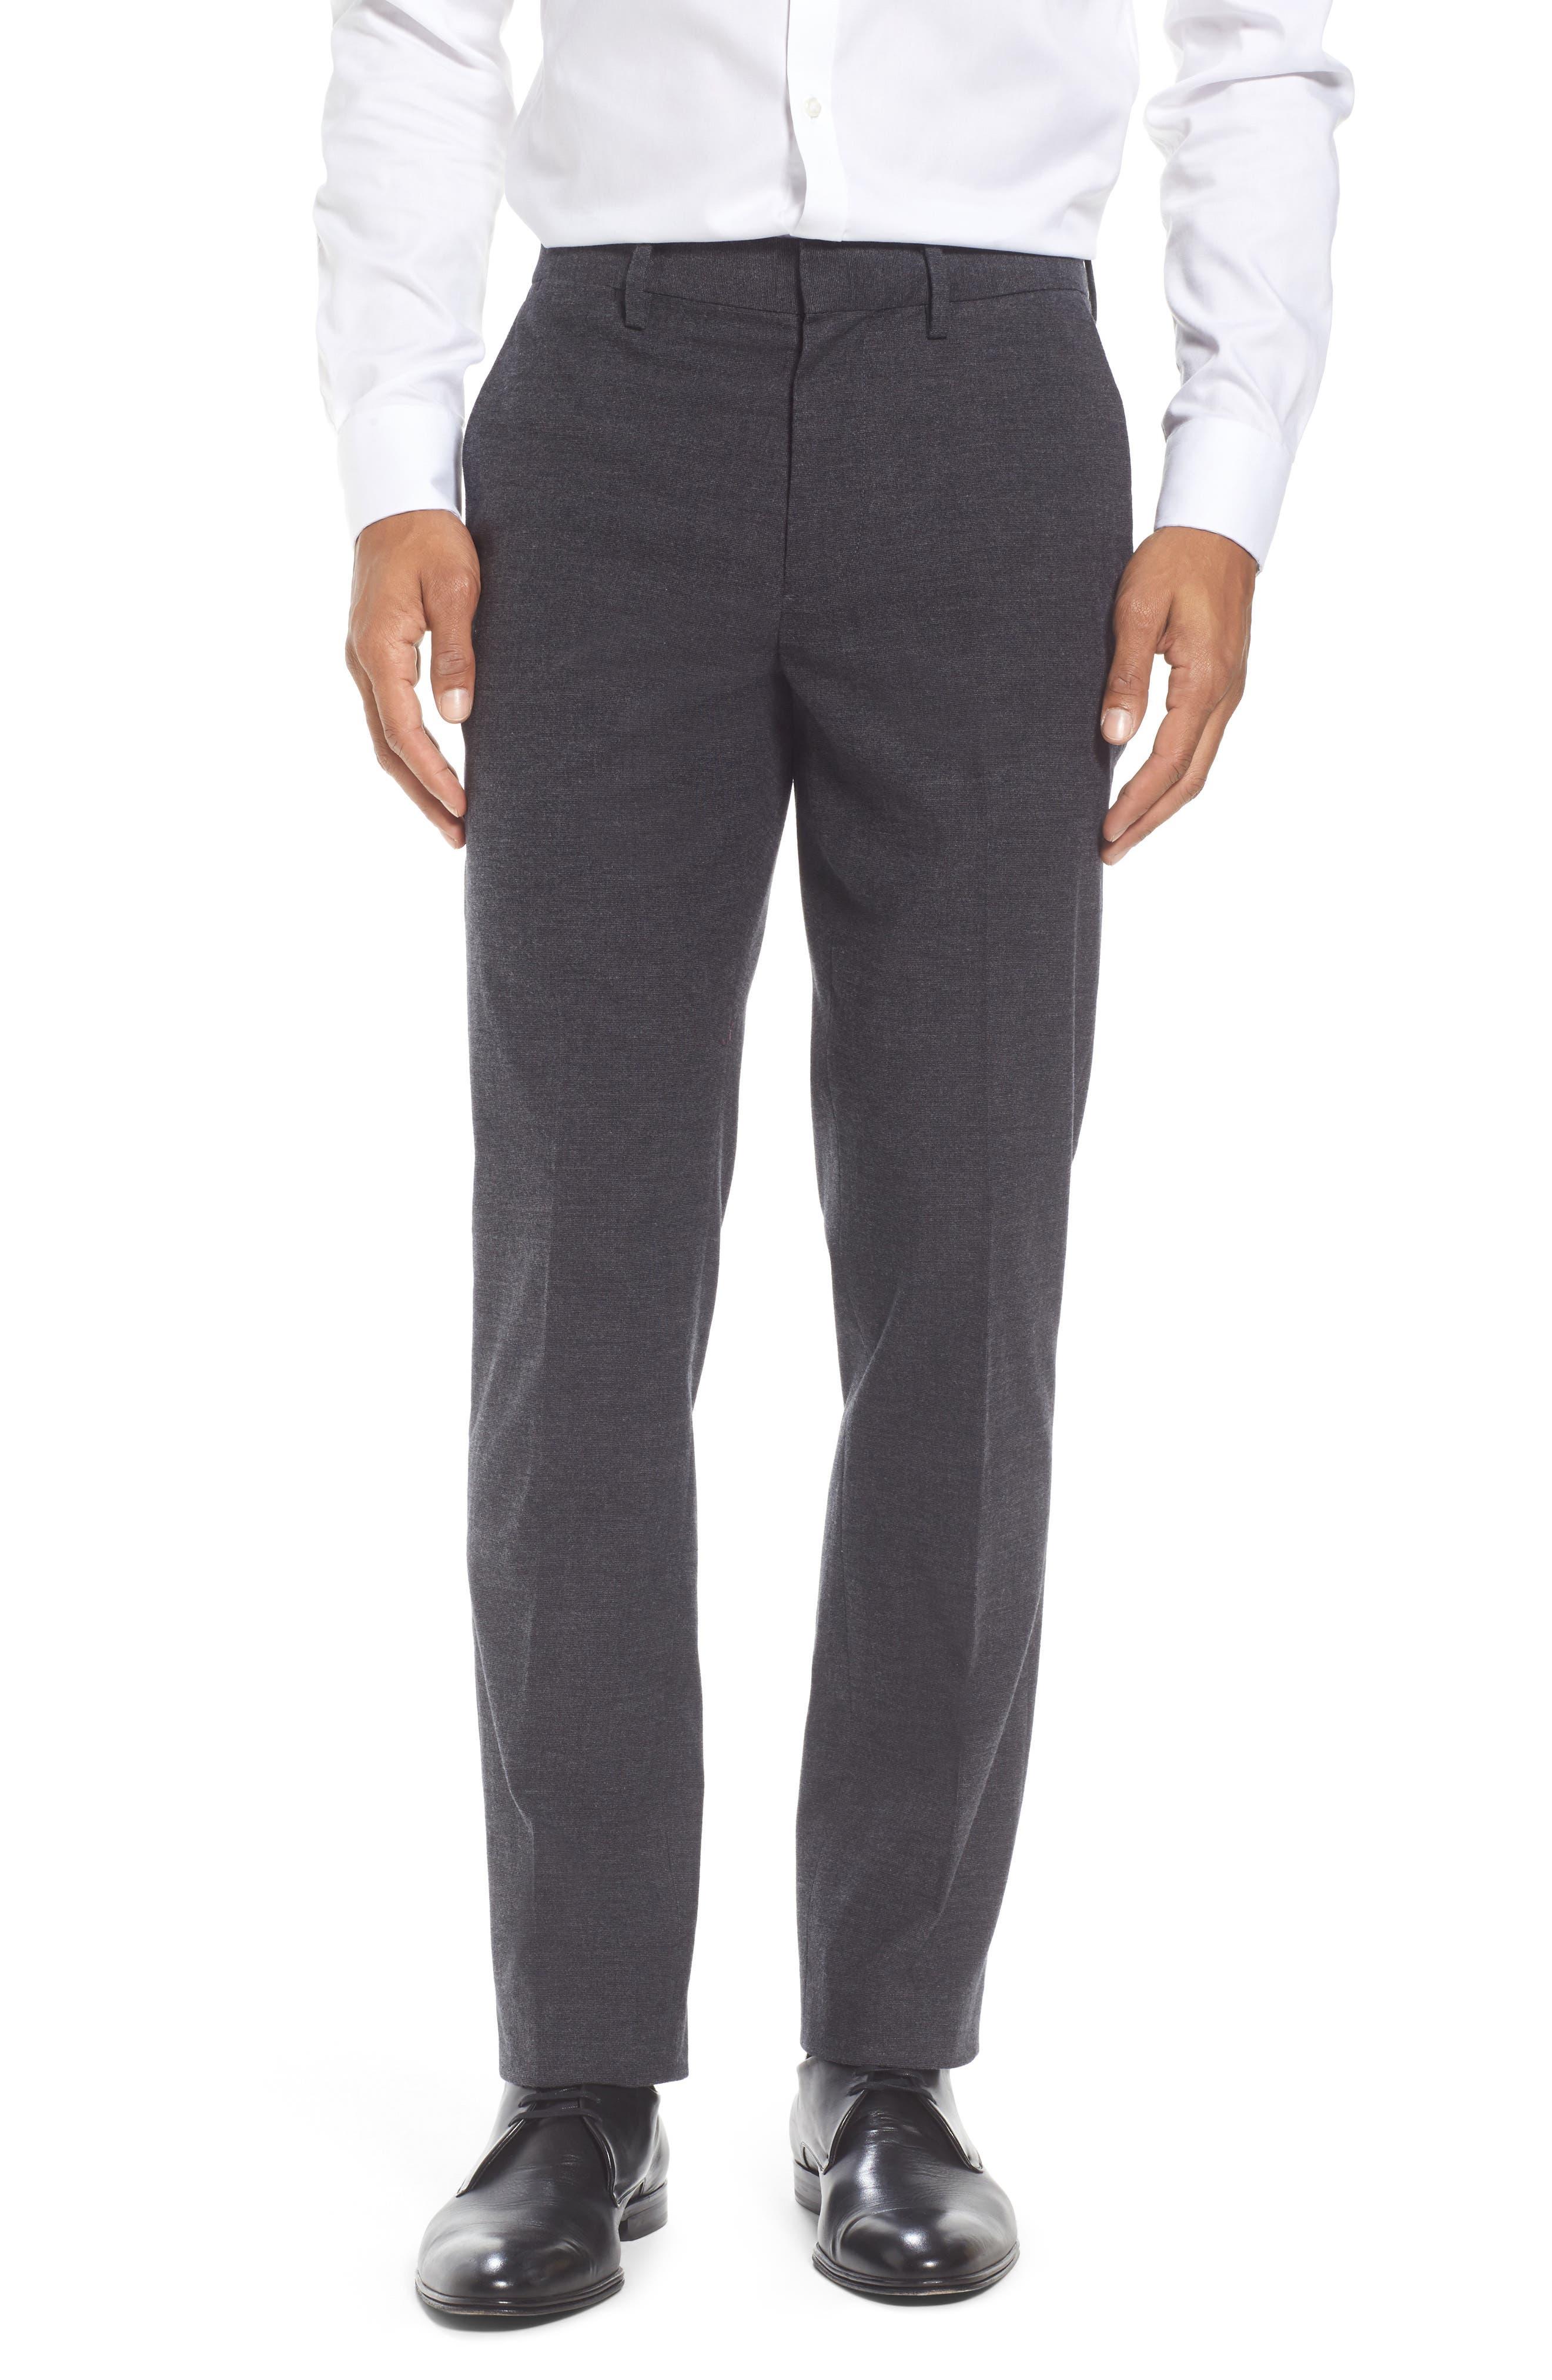 Main Image - Bonobos Foundation Slim Fit Trousers